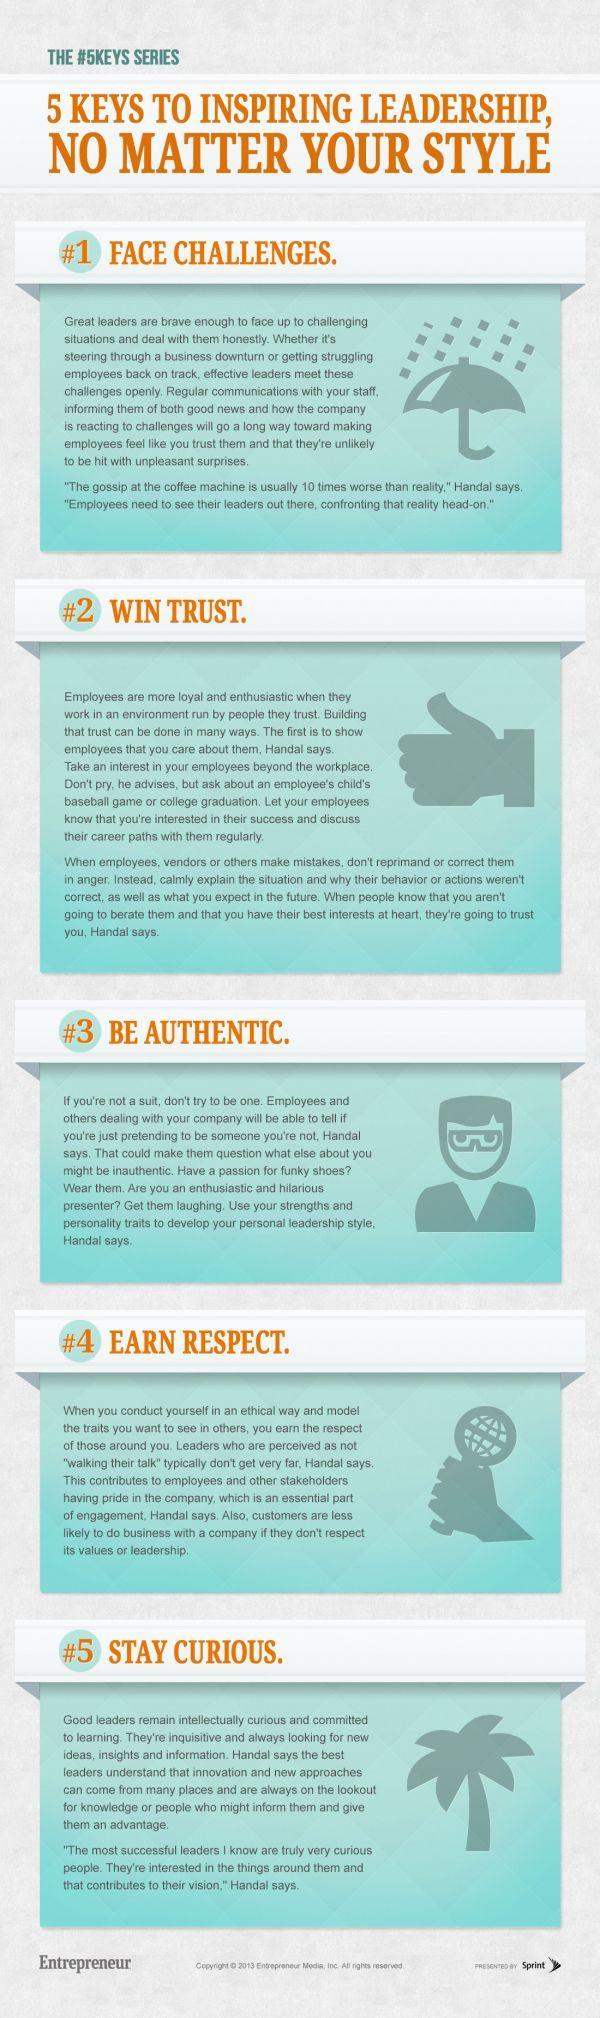 5 Keys to Inspiring Leadership, No matter your style #infographic #smallbiz #leadershipLanguage | Writing style | Grammar infographics